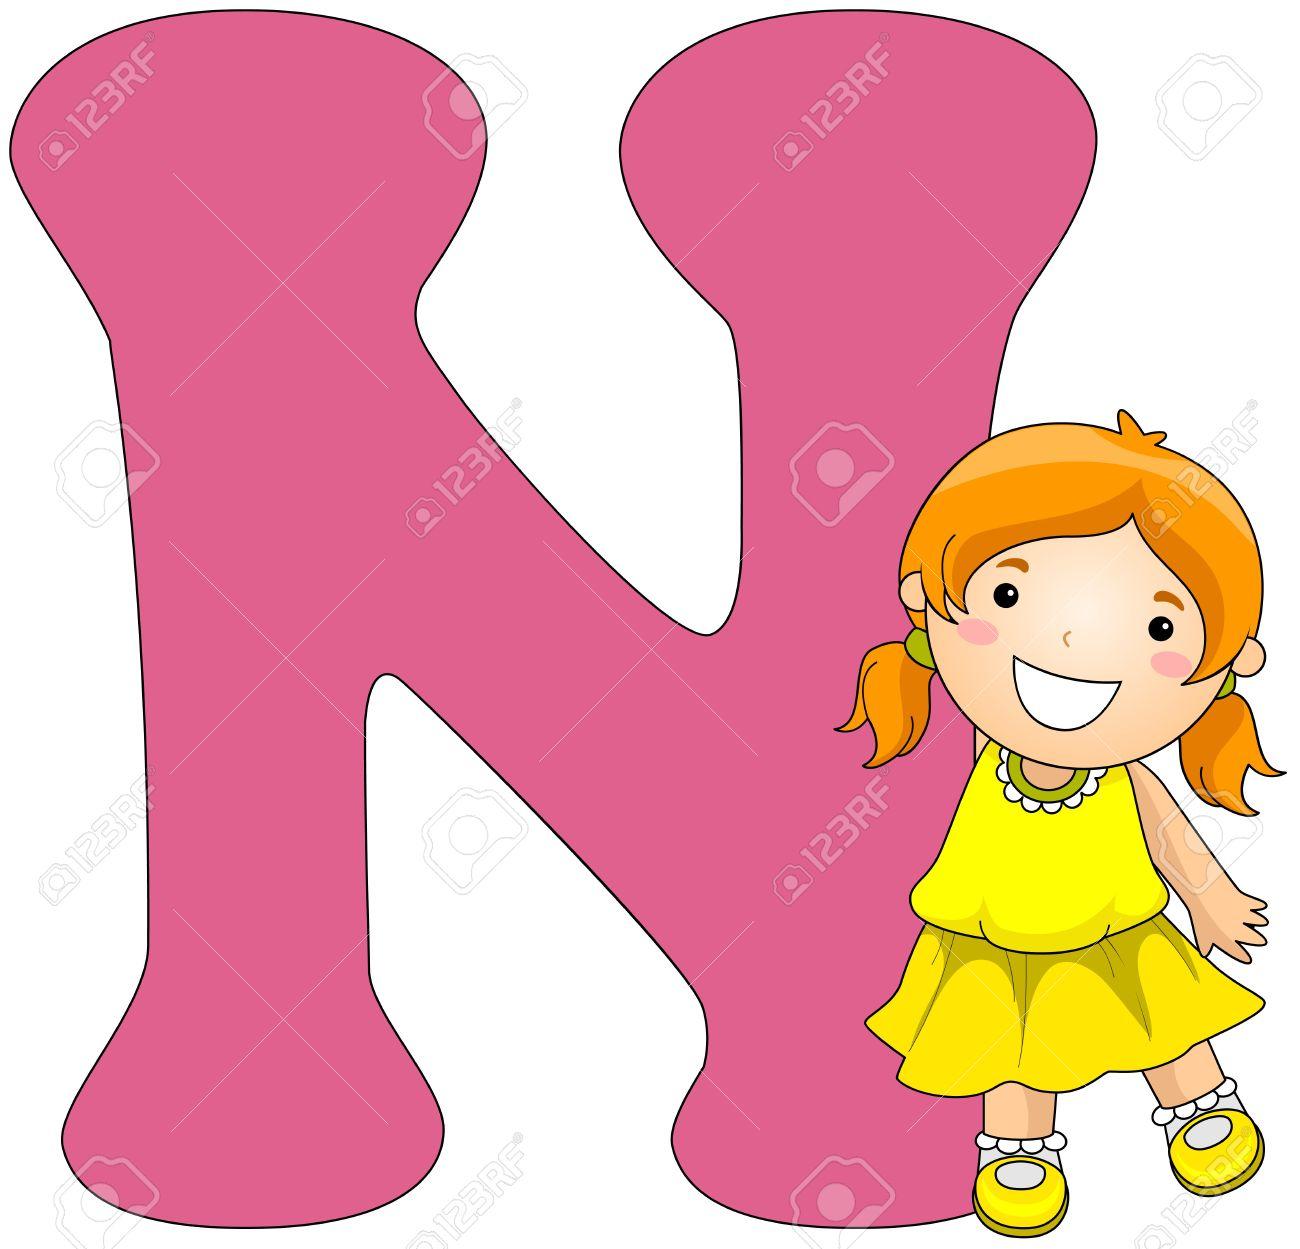 hight resolution of illustration illustration of a girl posing beside a letter n